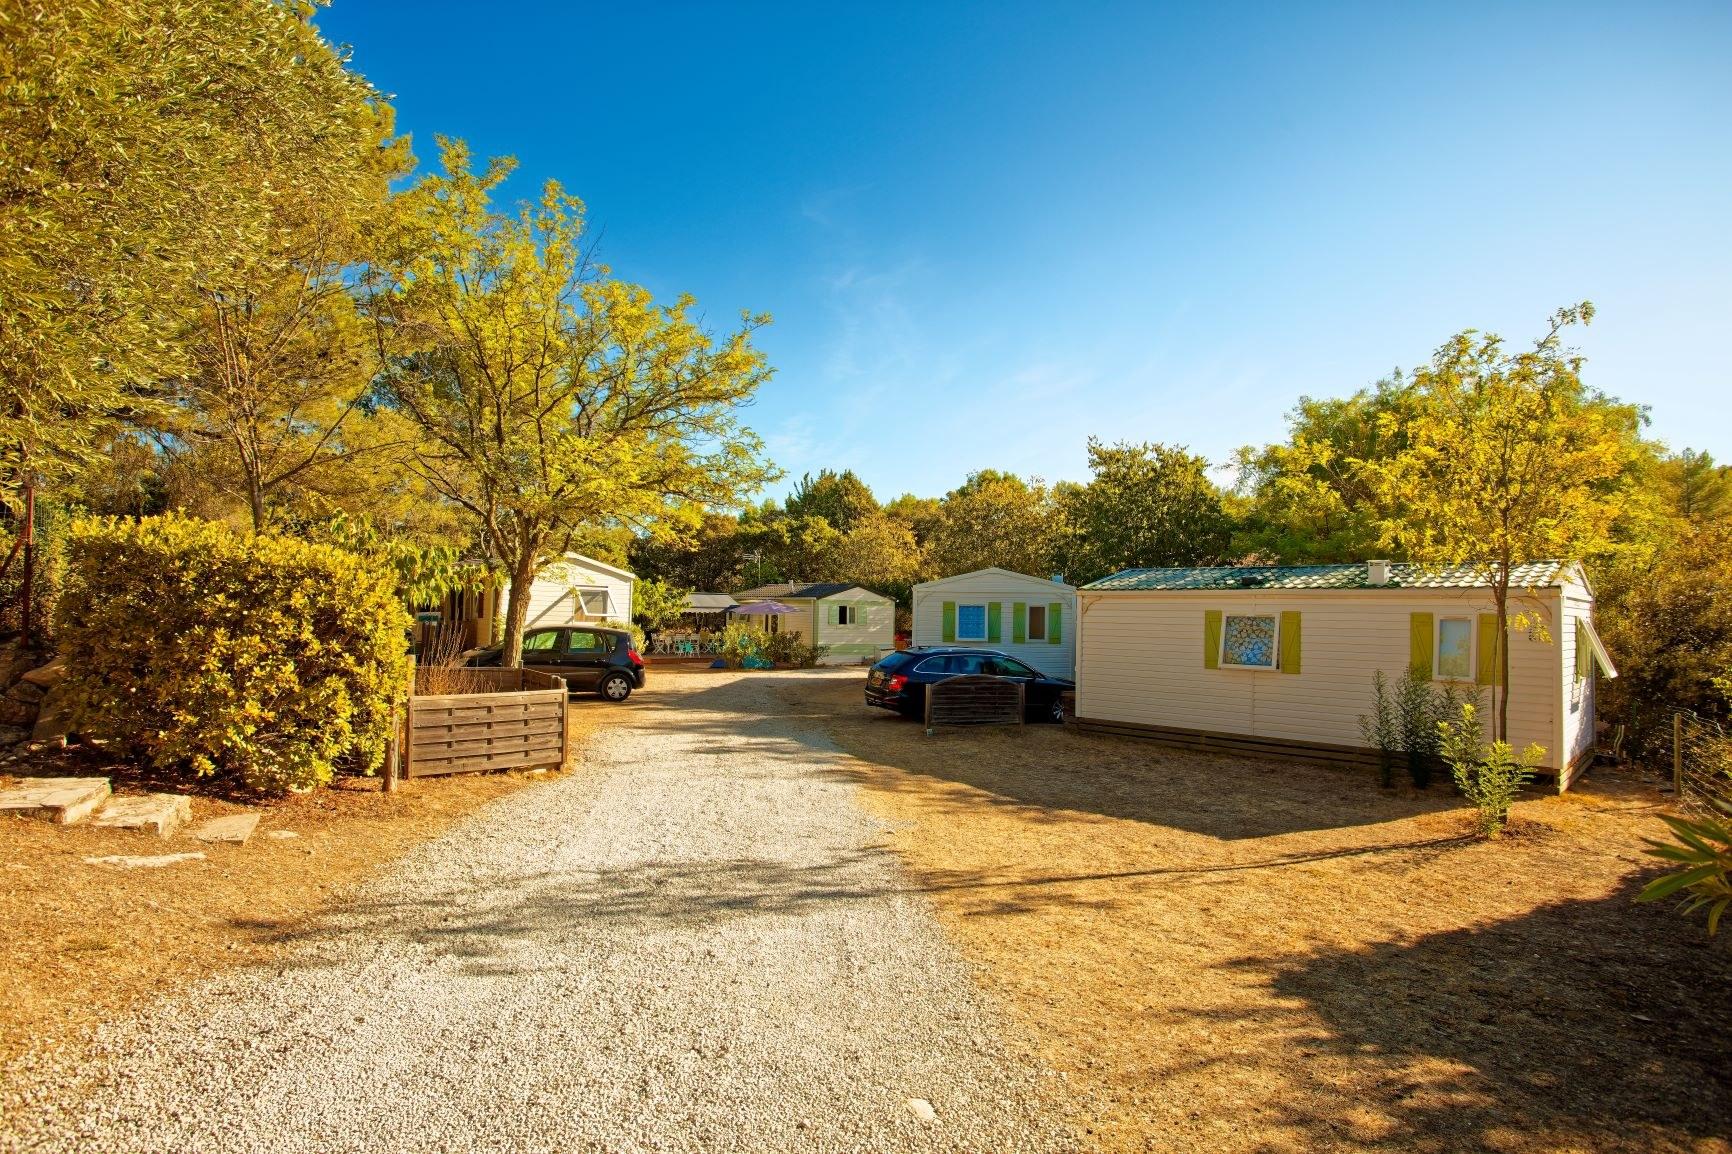 000504 camping de l olivier - junas - photo Aspheries